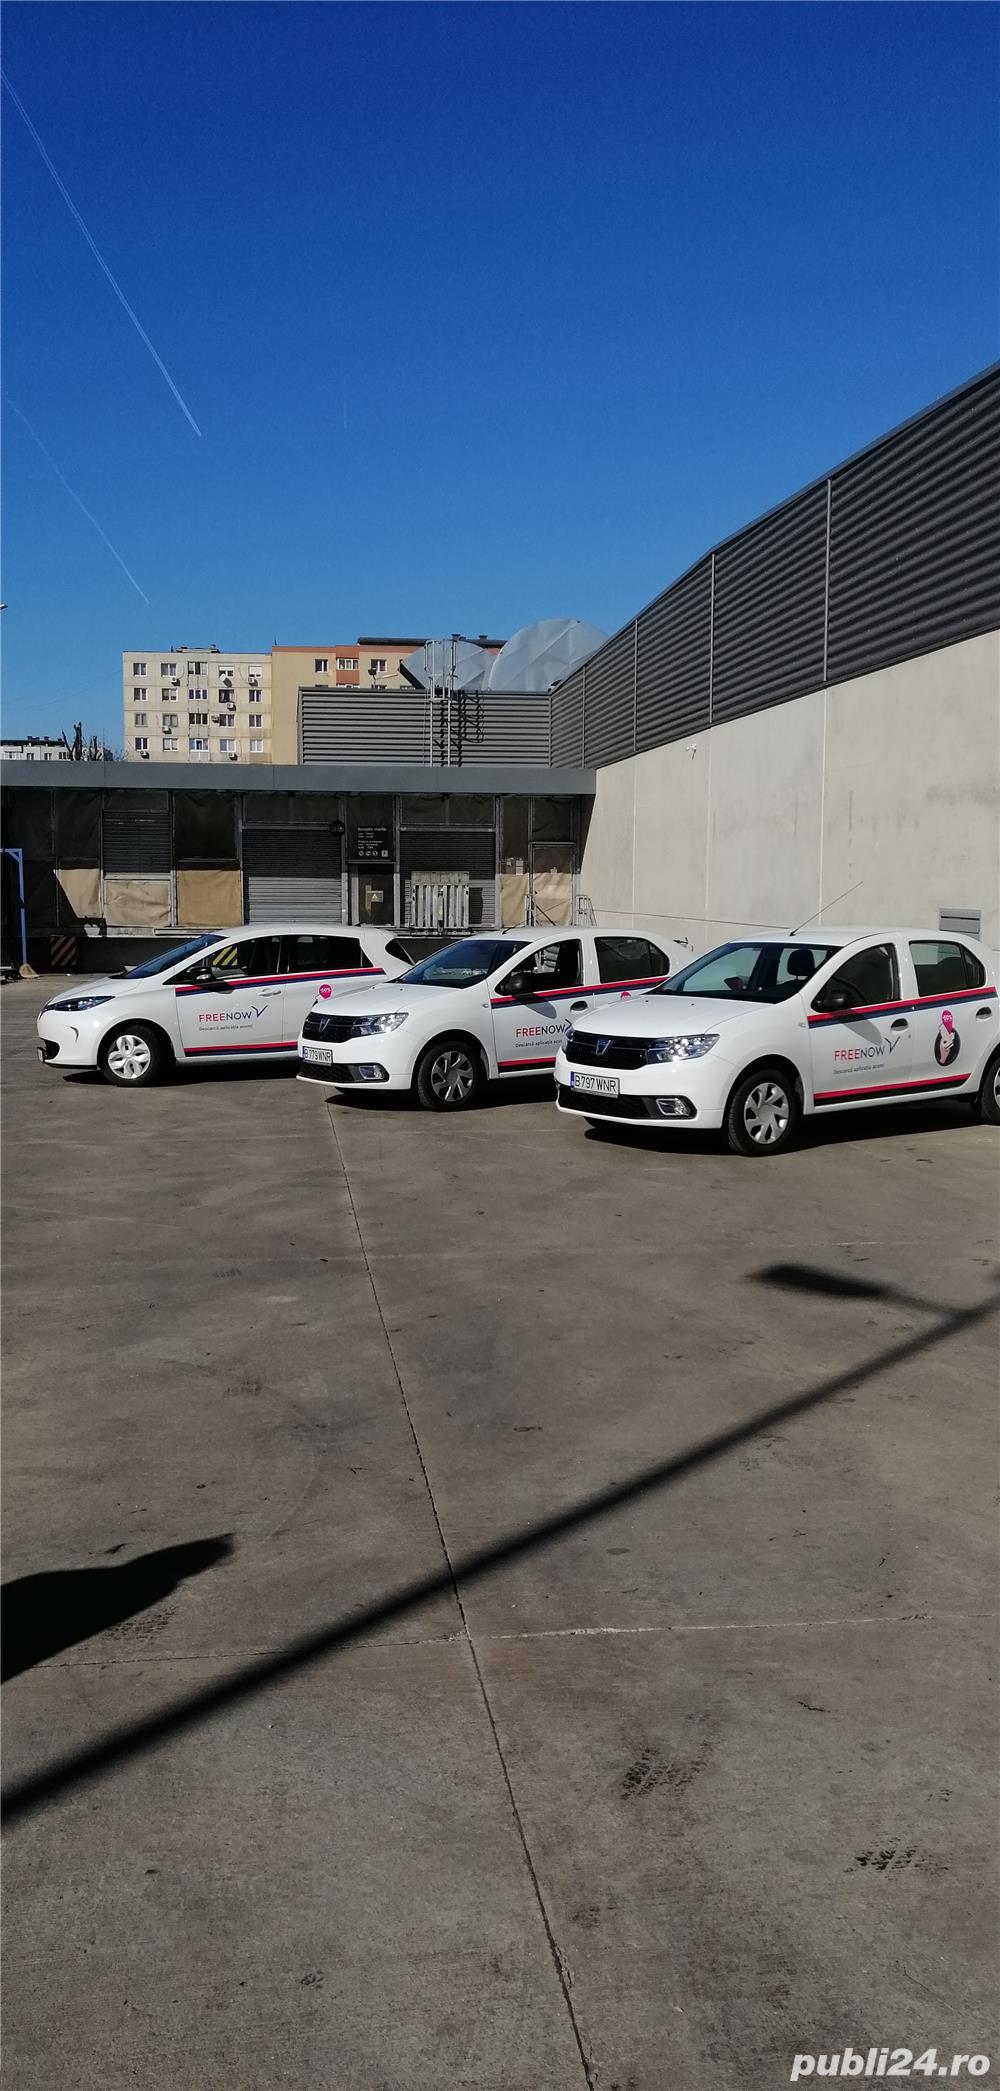 Firma noua colaboratoare Free now, uber, bolt, cautam șoferi colaboratori